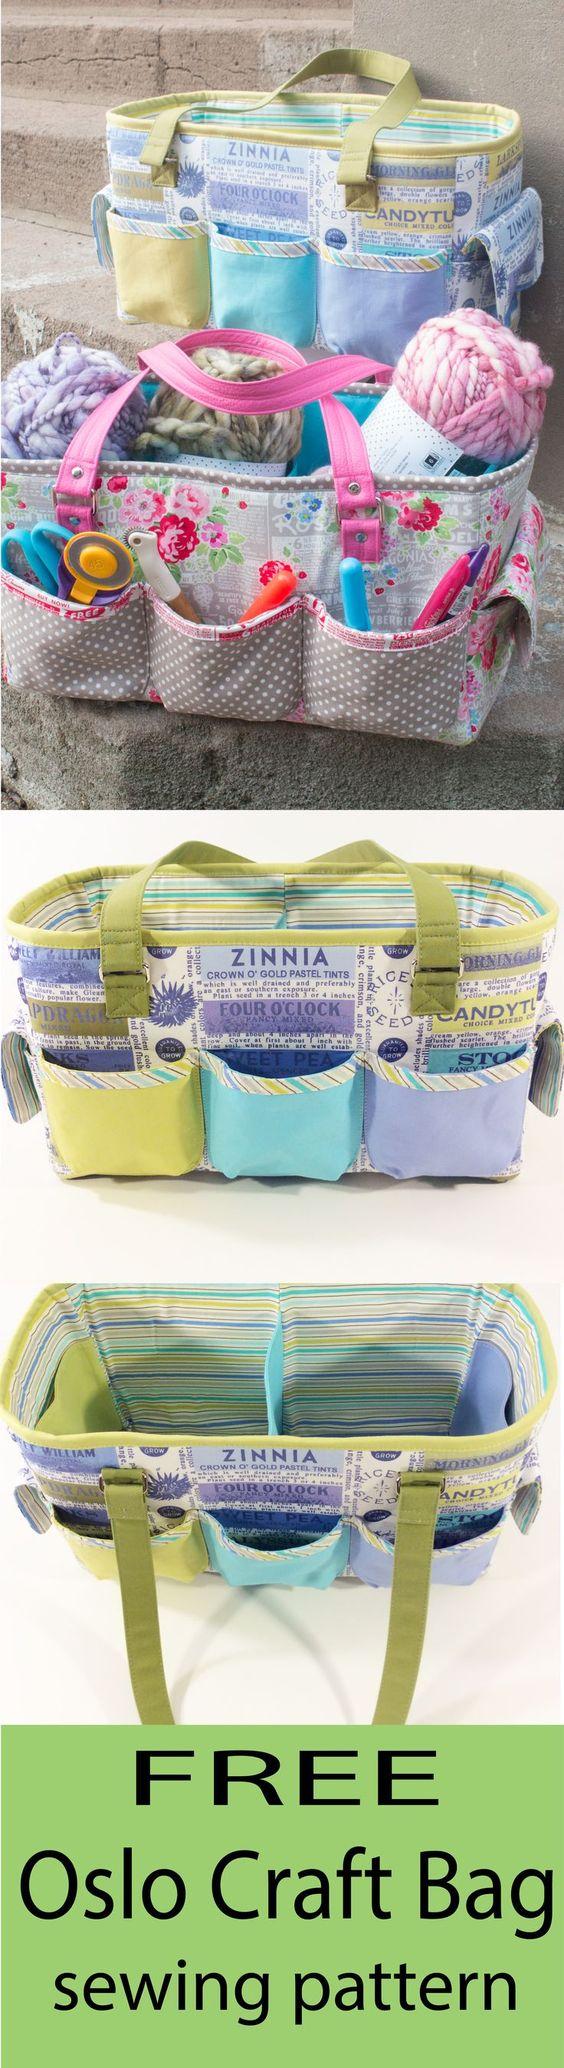 Free sewing pattern. Love this crafty storage bag sewing pattern.